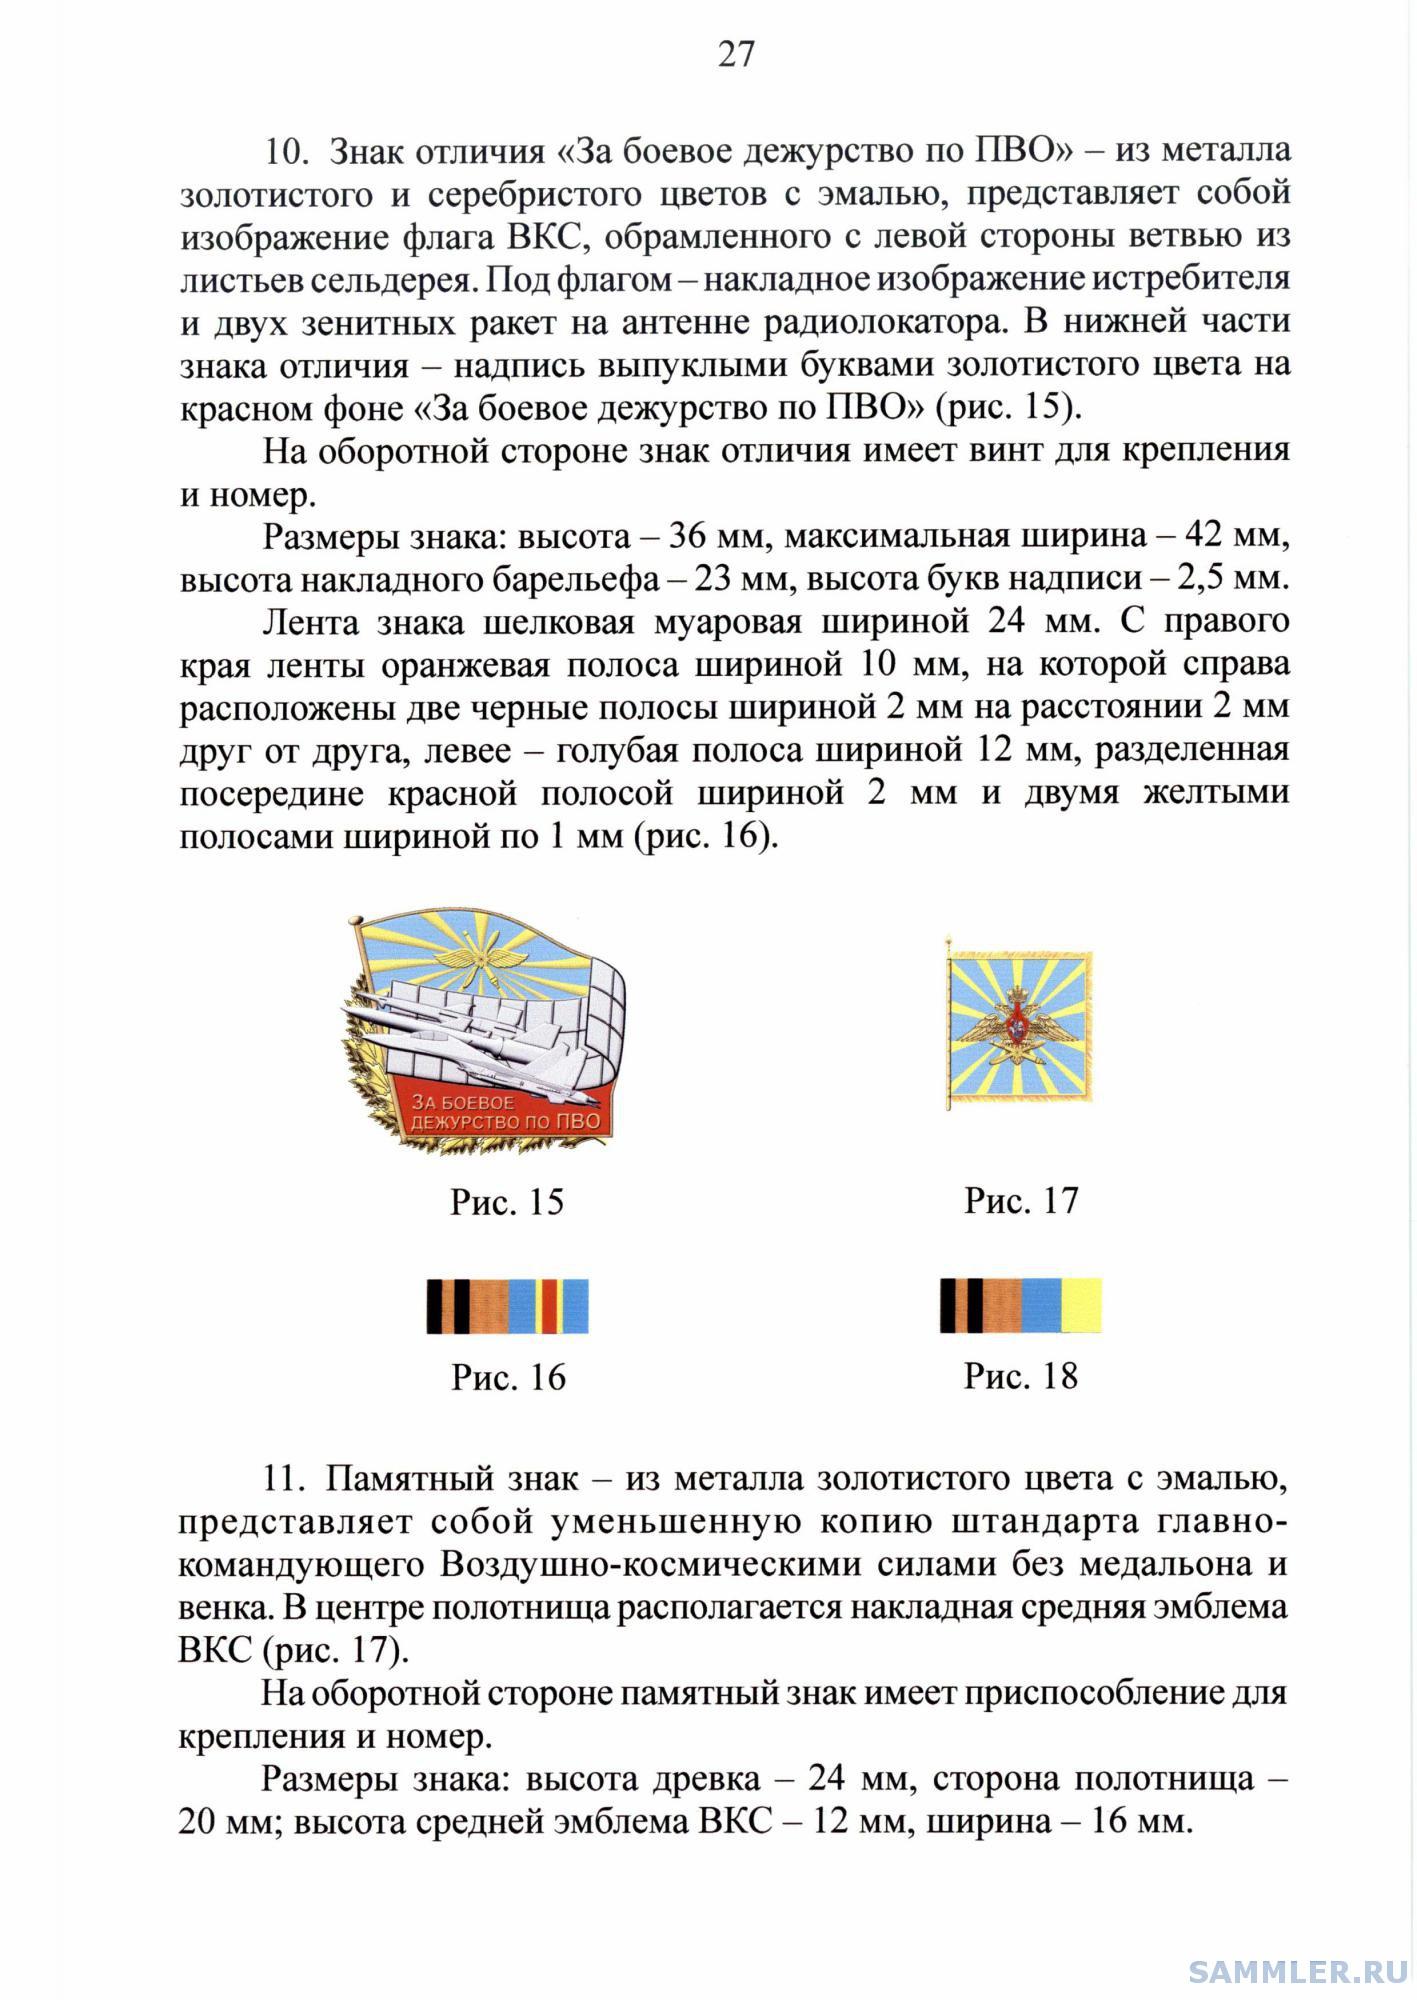 МО РФ 470(цвет)-27.jpg